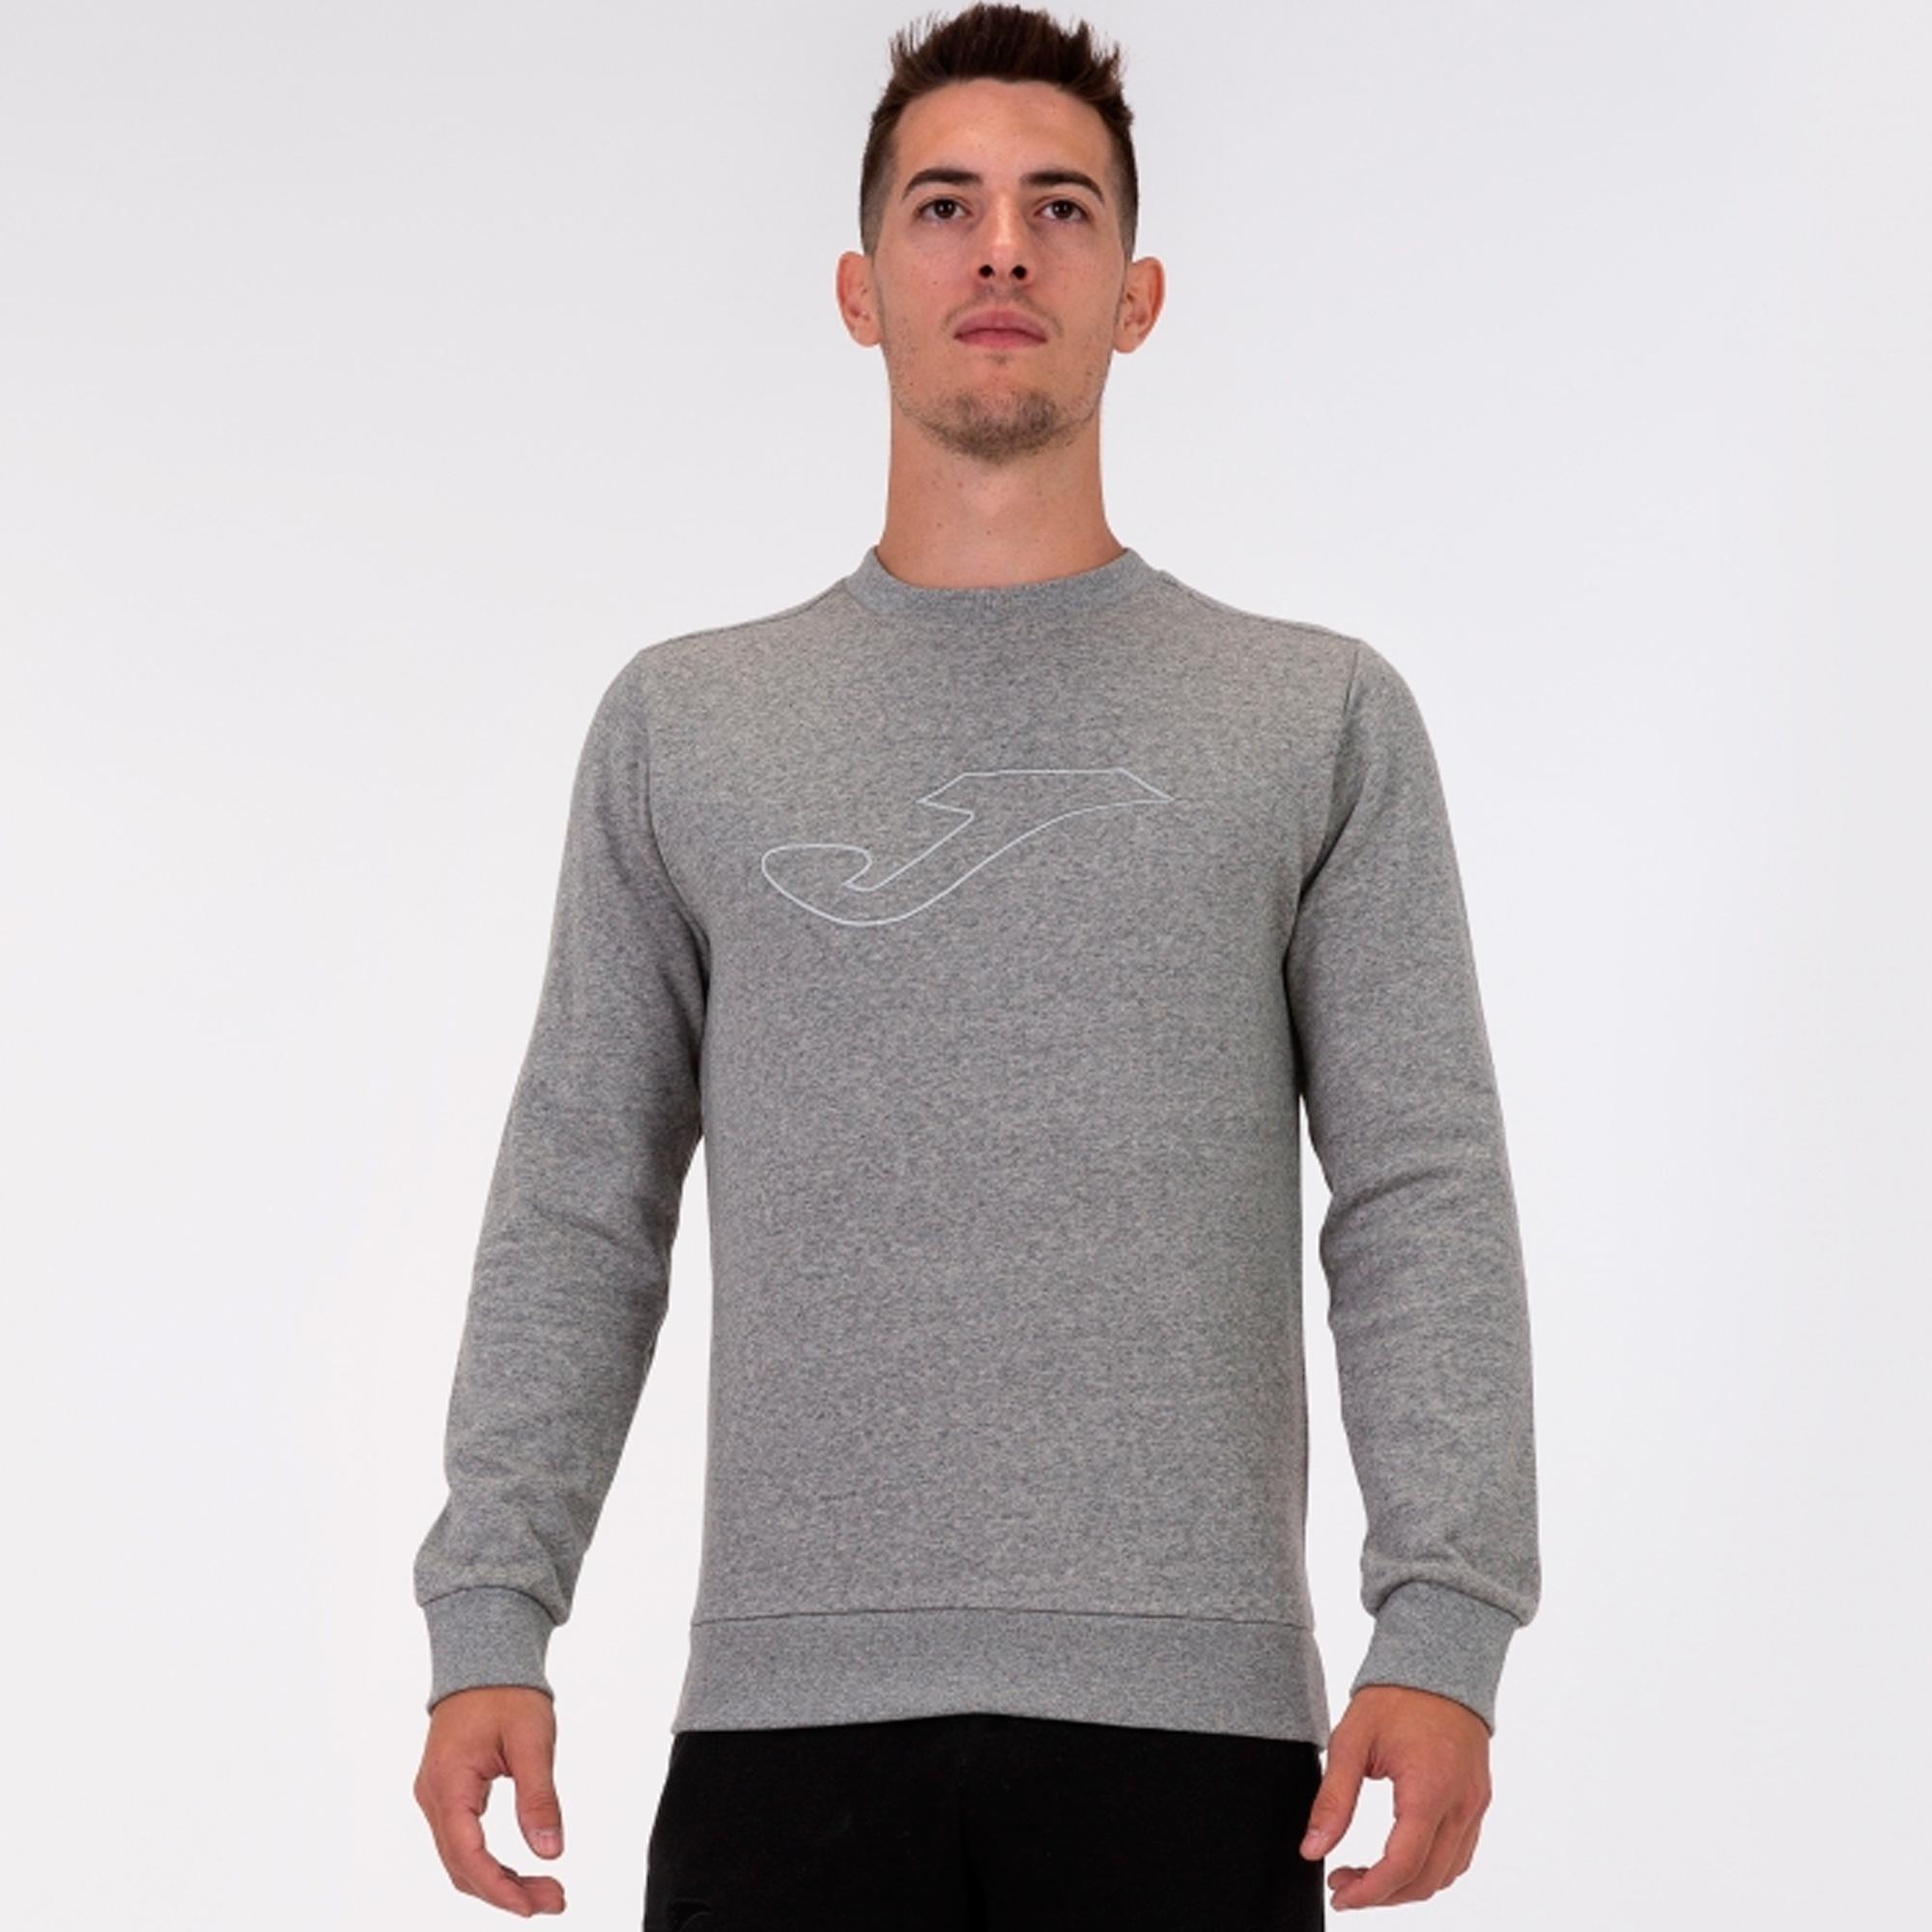 Comprar Joma  Orion melange dark sweatshirt